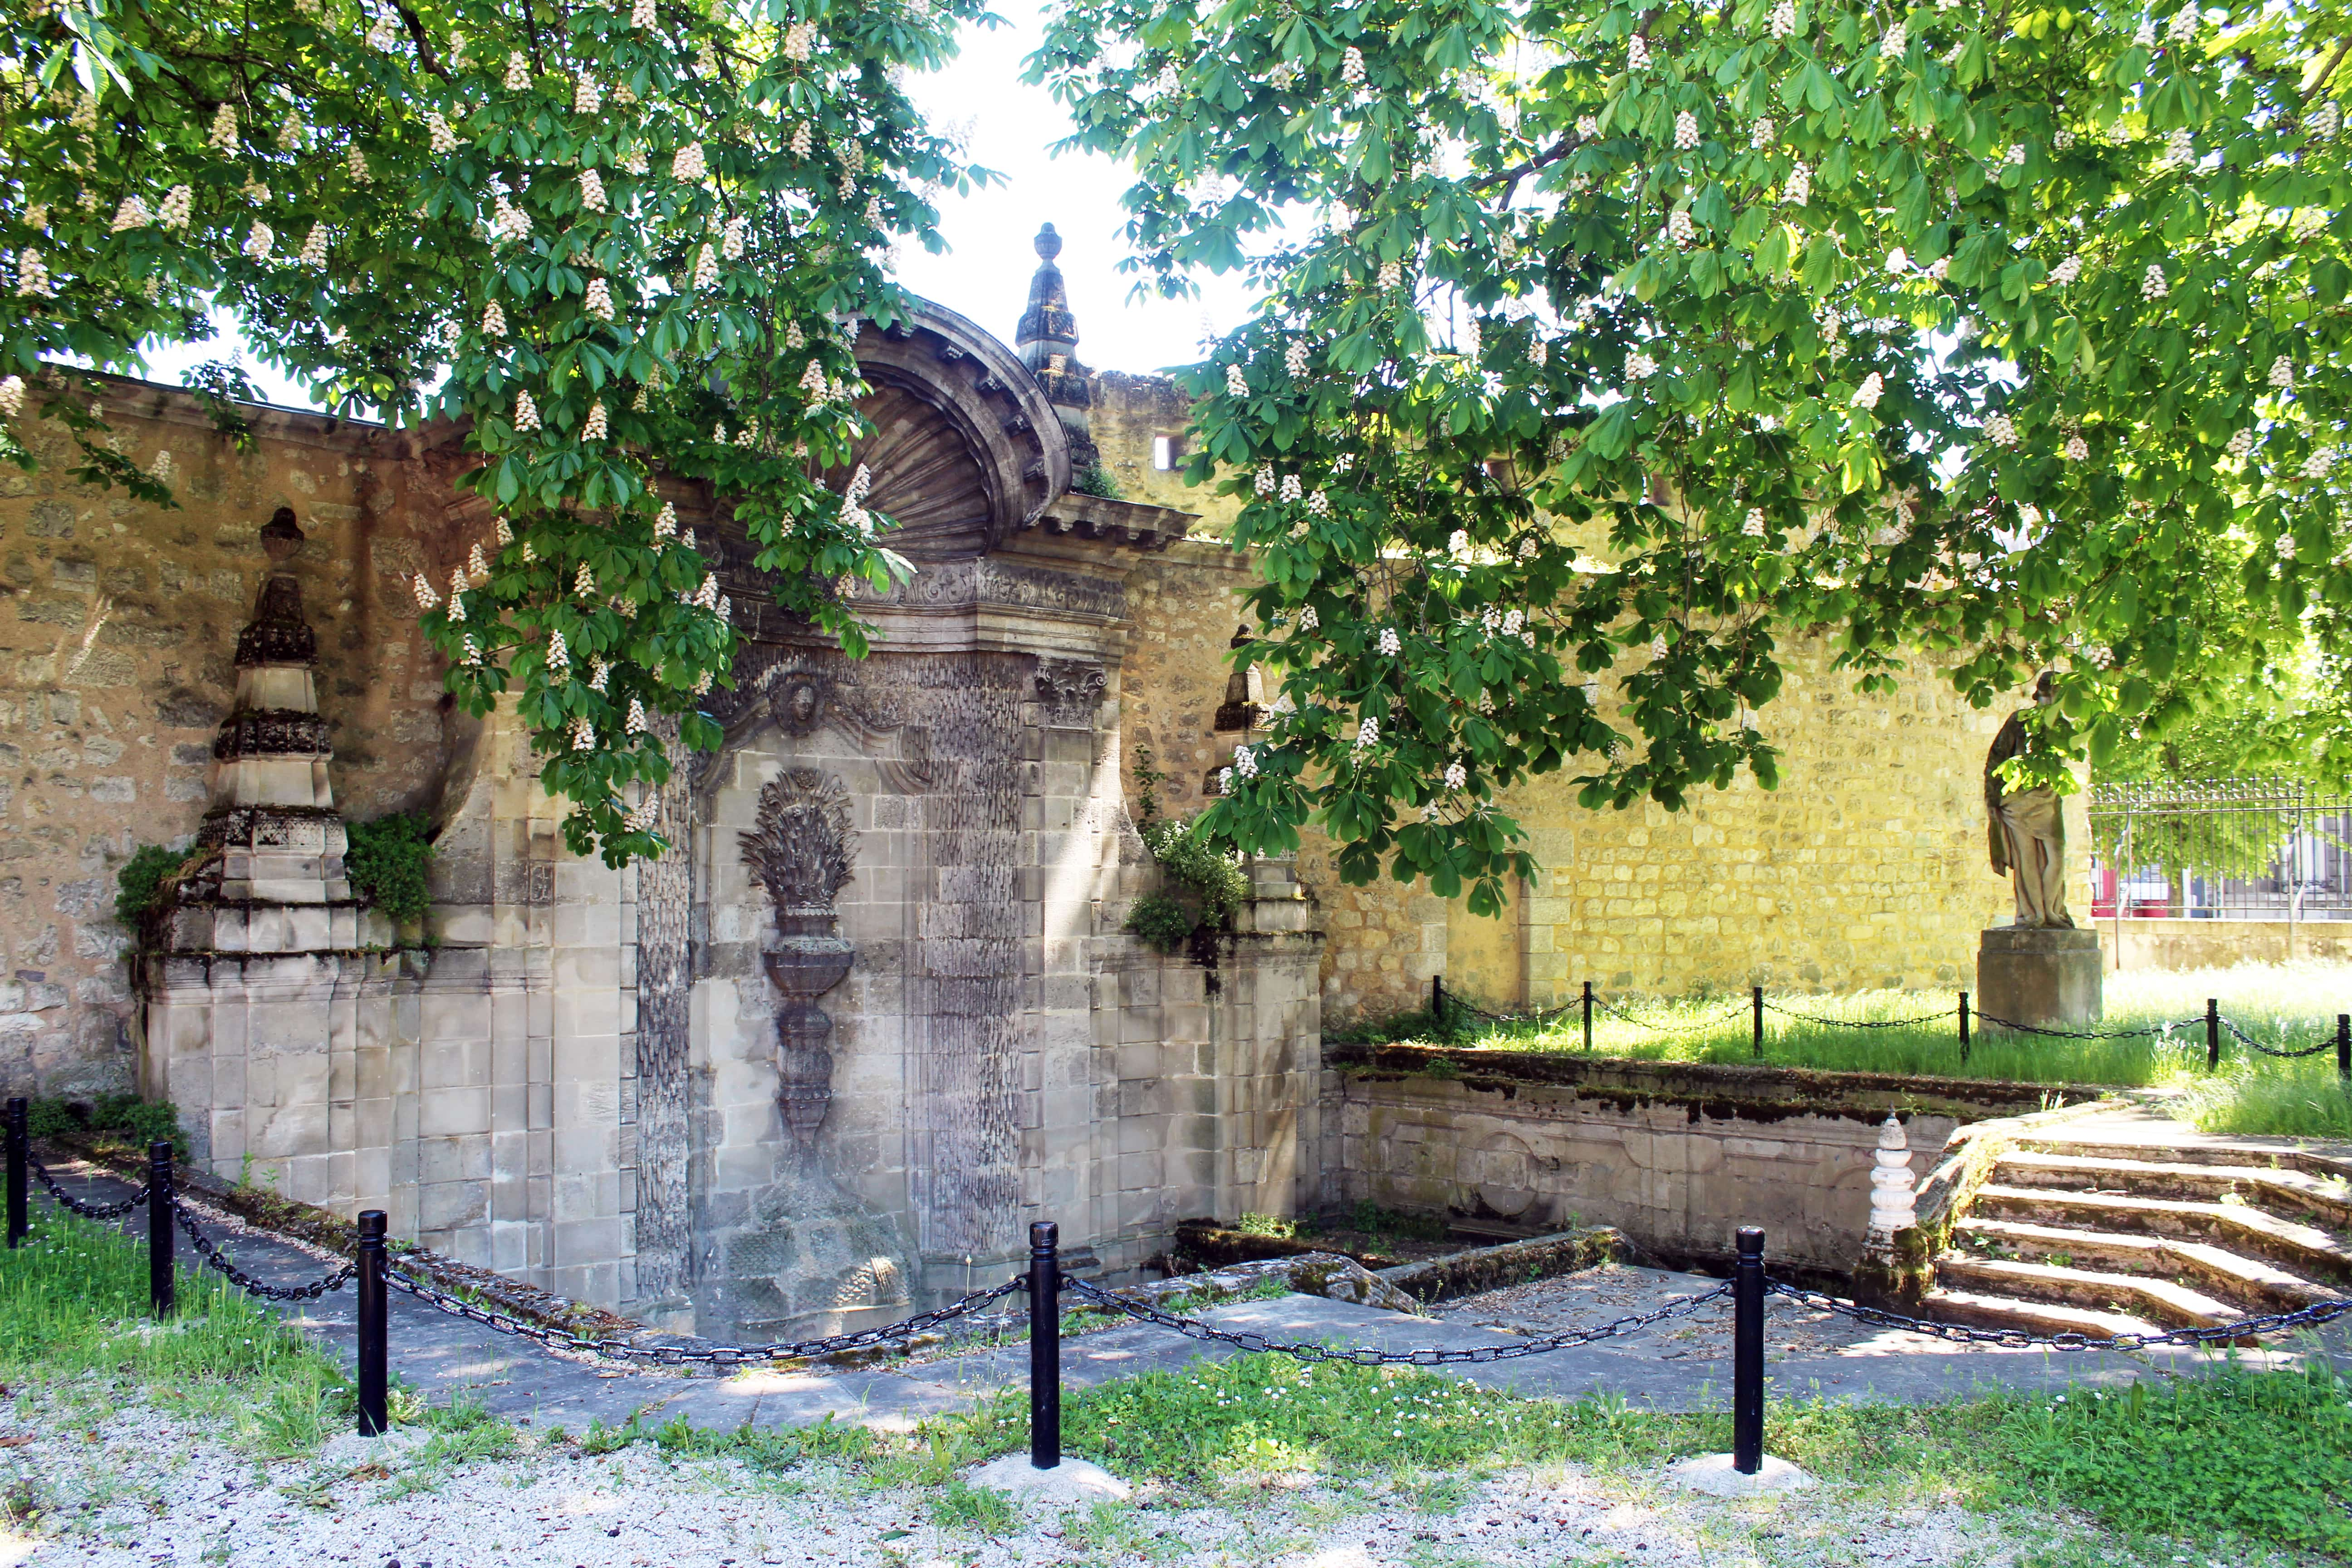 Fontaine Sainte Croix